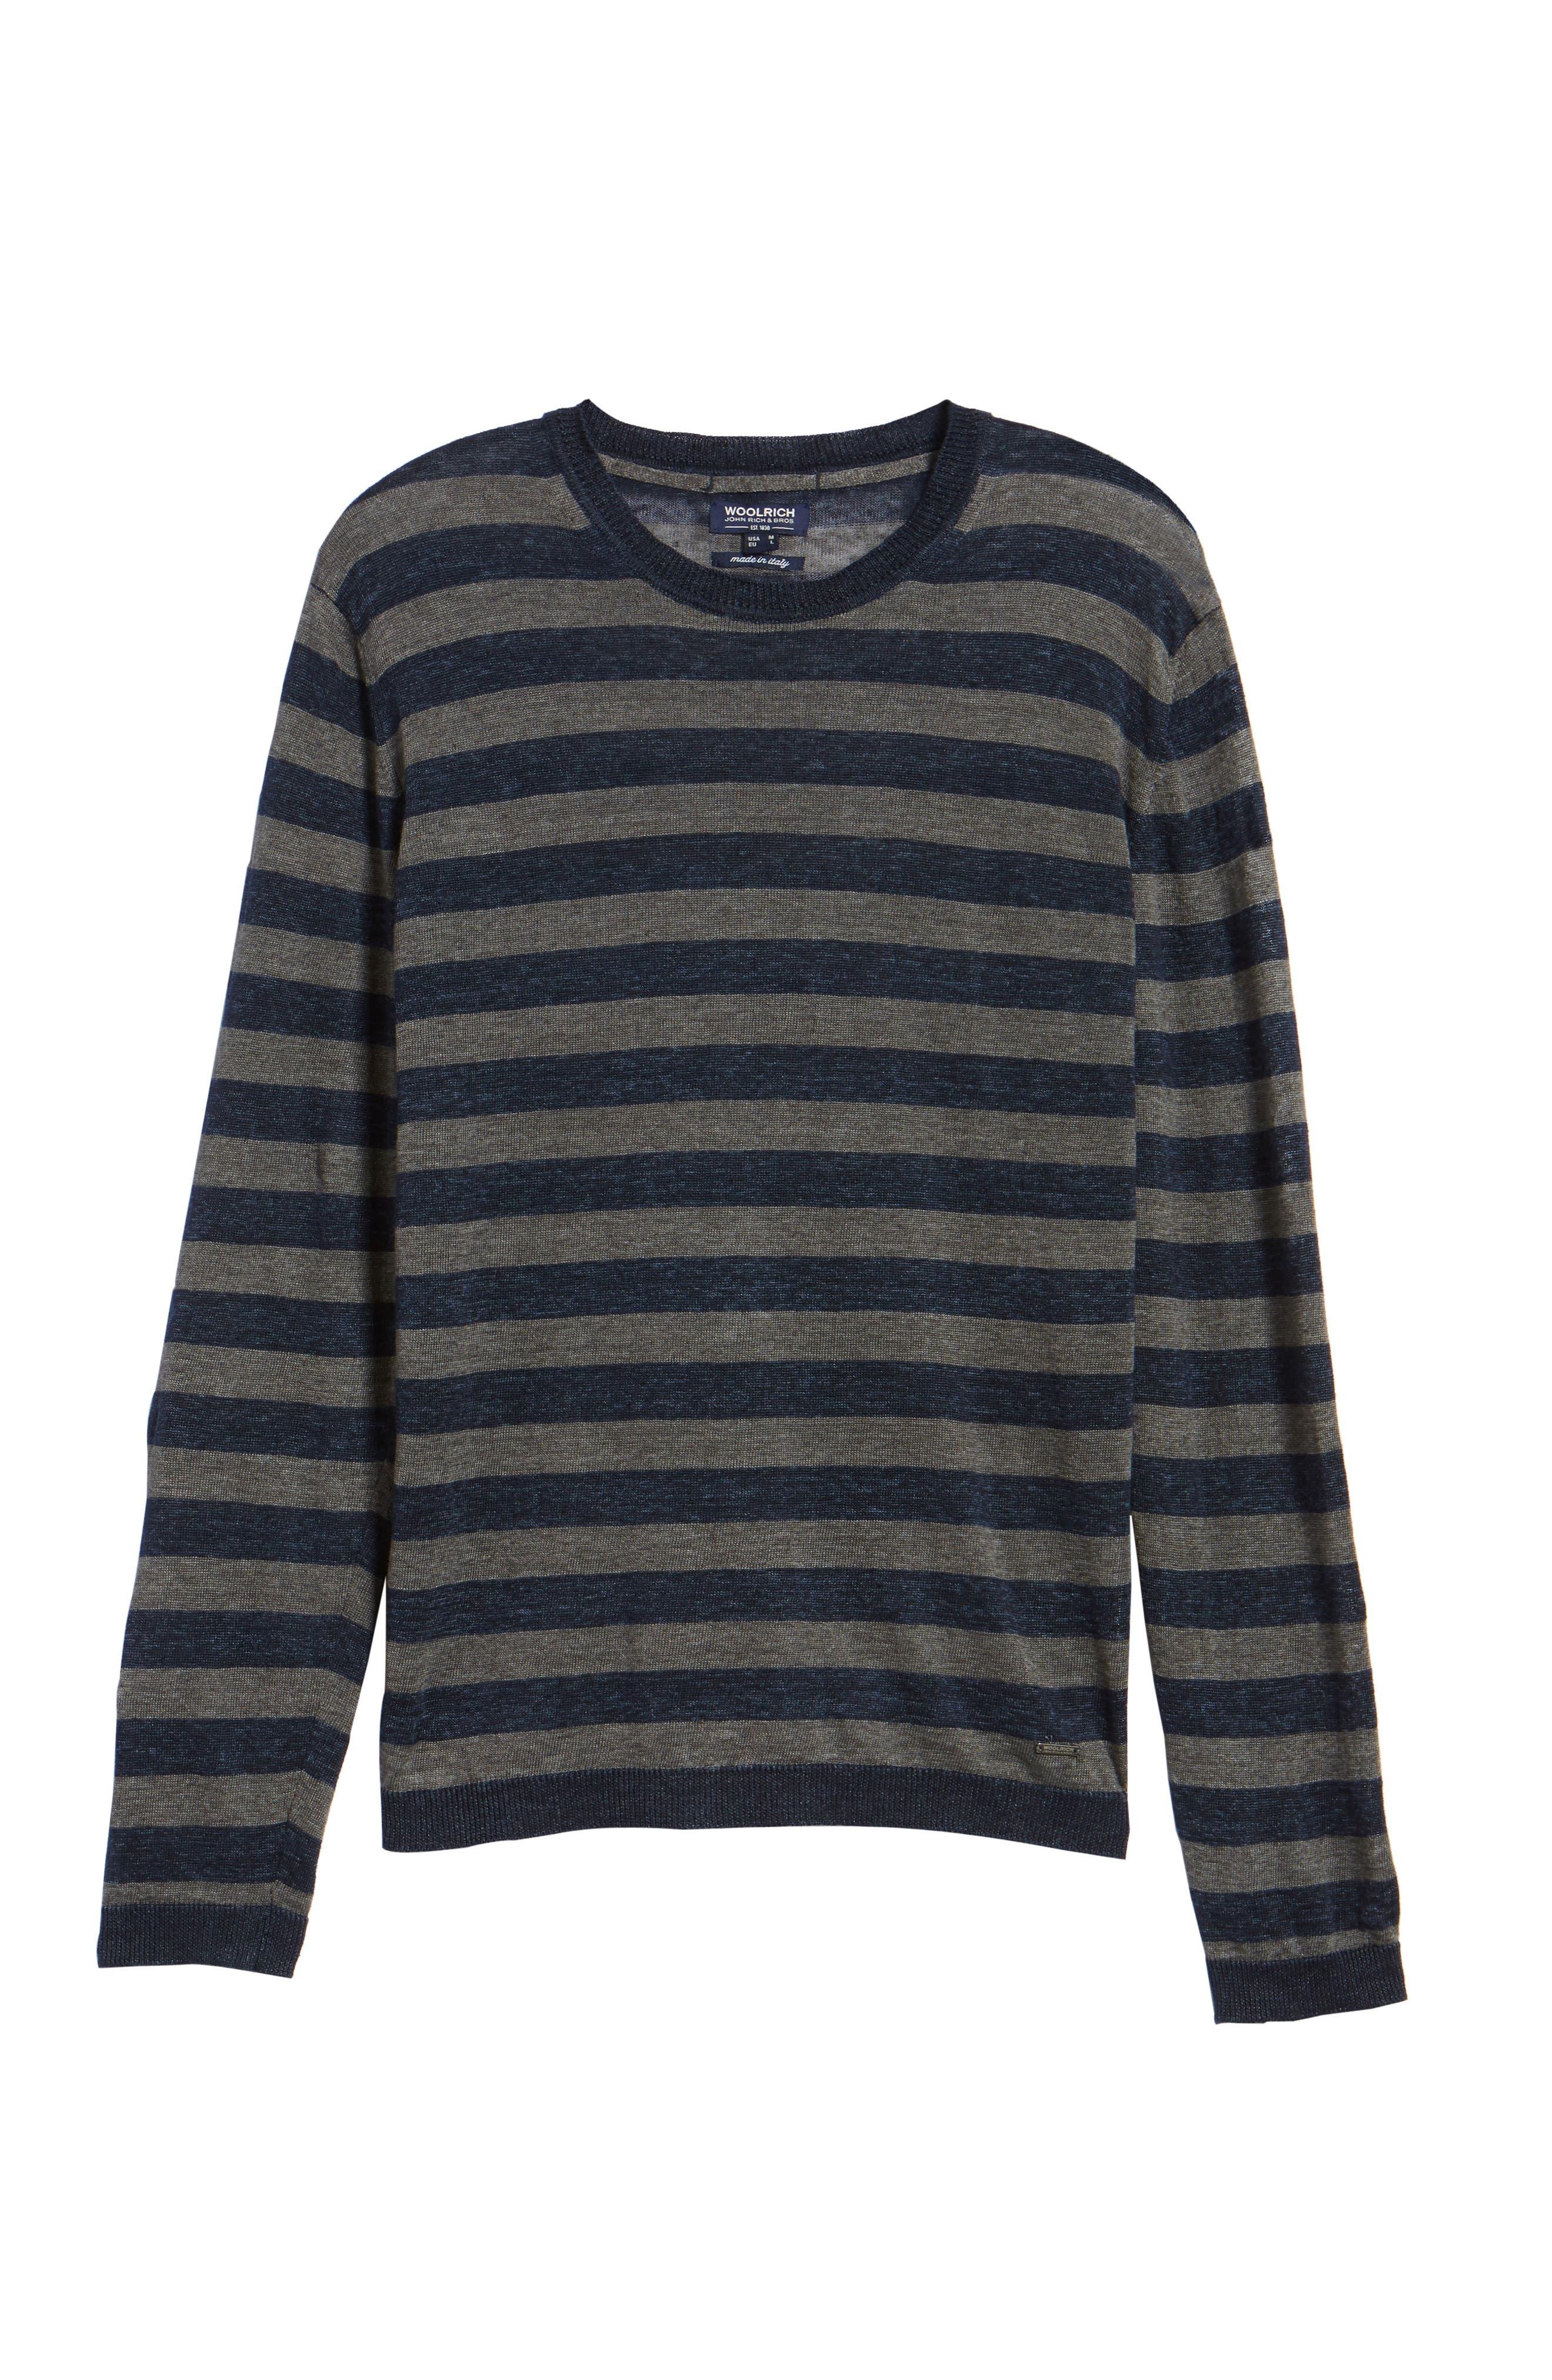 & Bros. Stripe Linen Sweater,                             Alternate thumbnail 6, color,